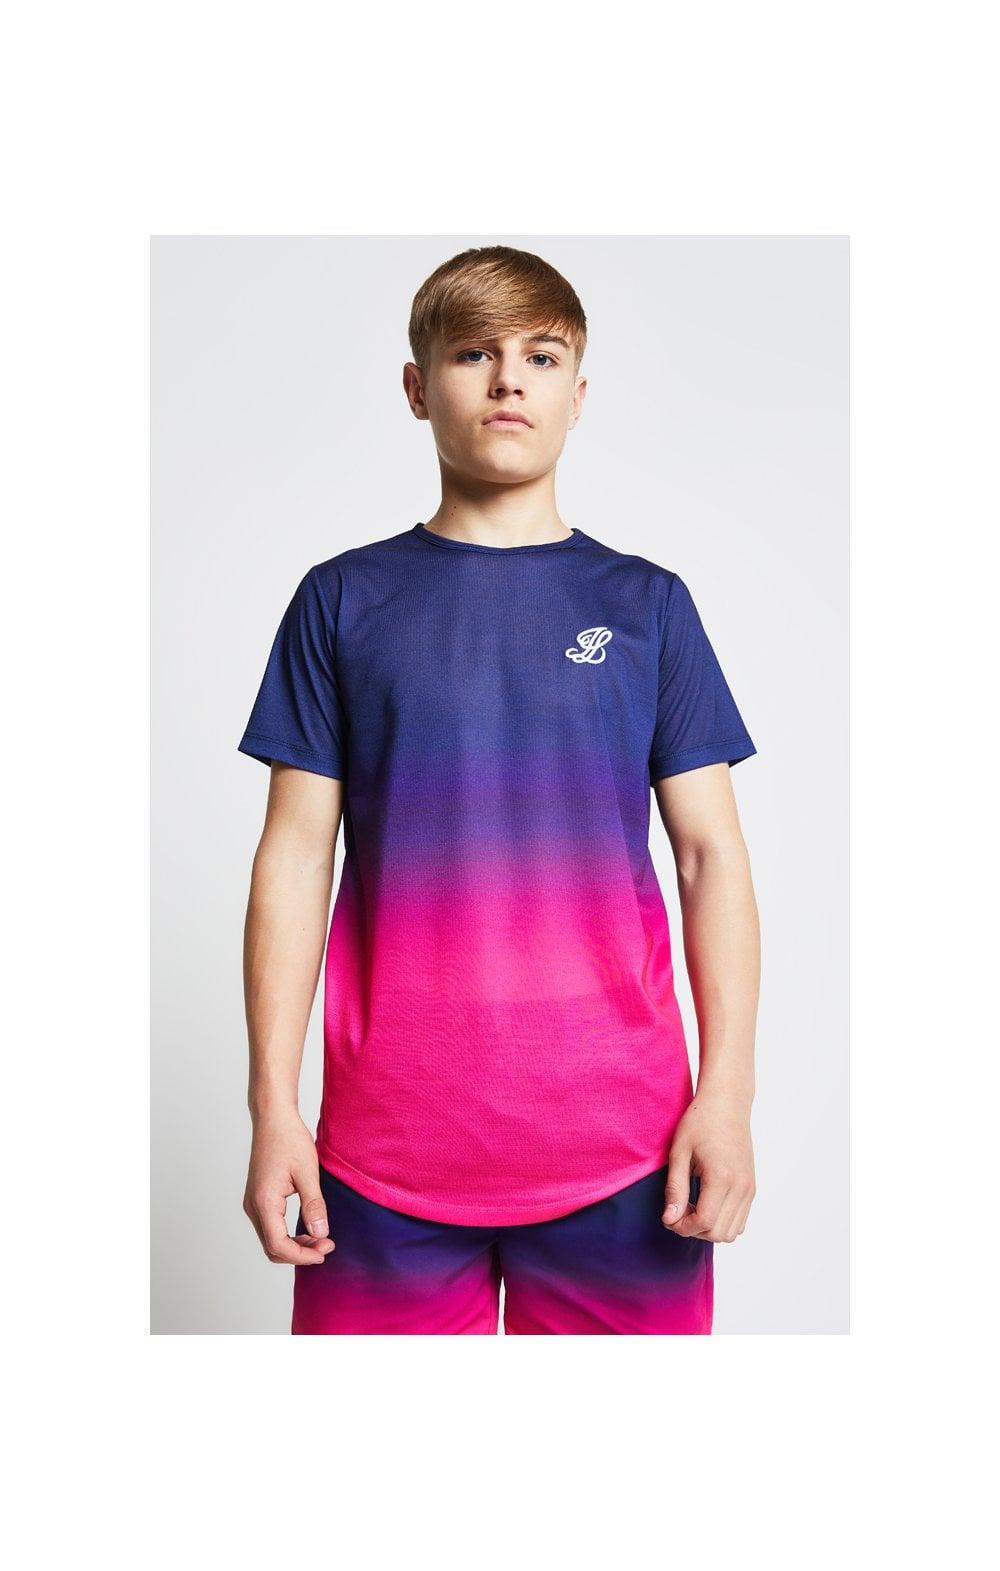 Illusive London Fade Tee - Navy & Pink  Kids Top Sizes: 15 YRS